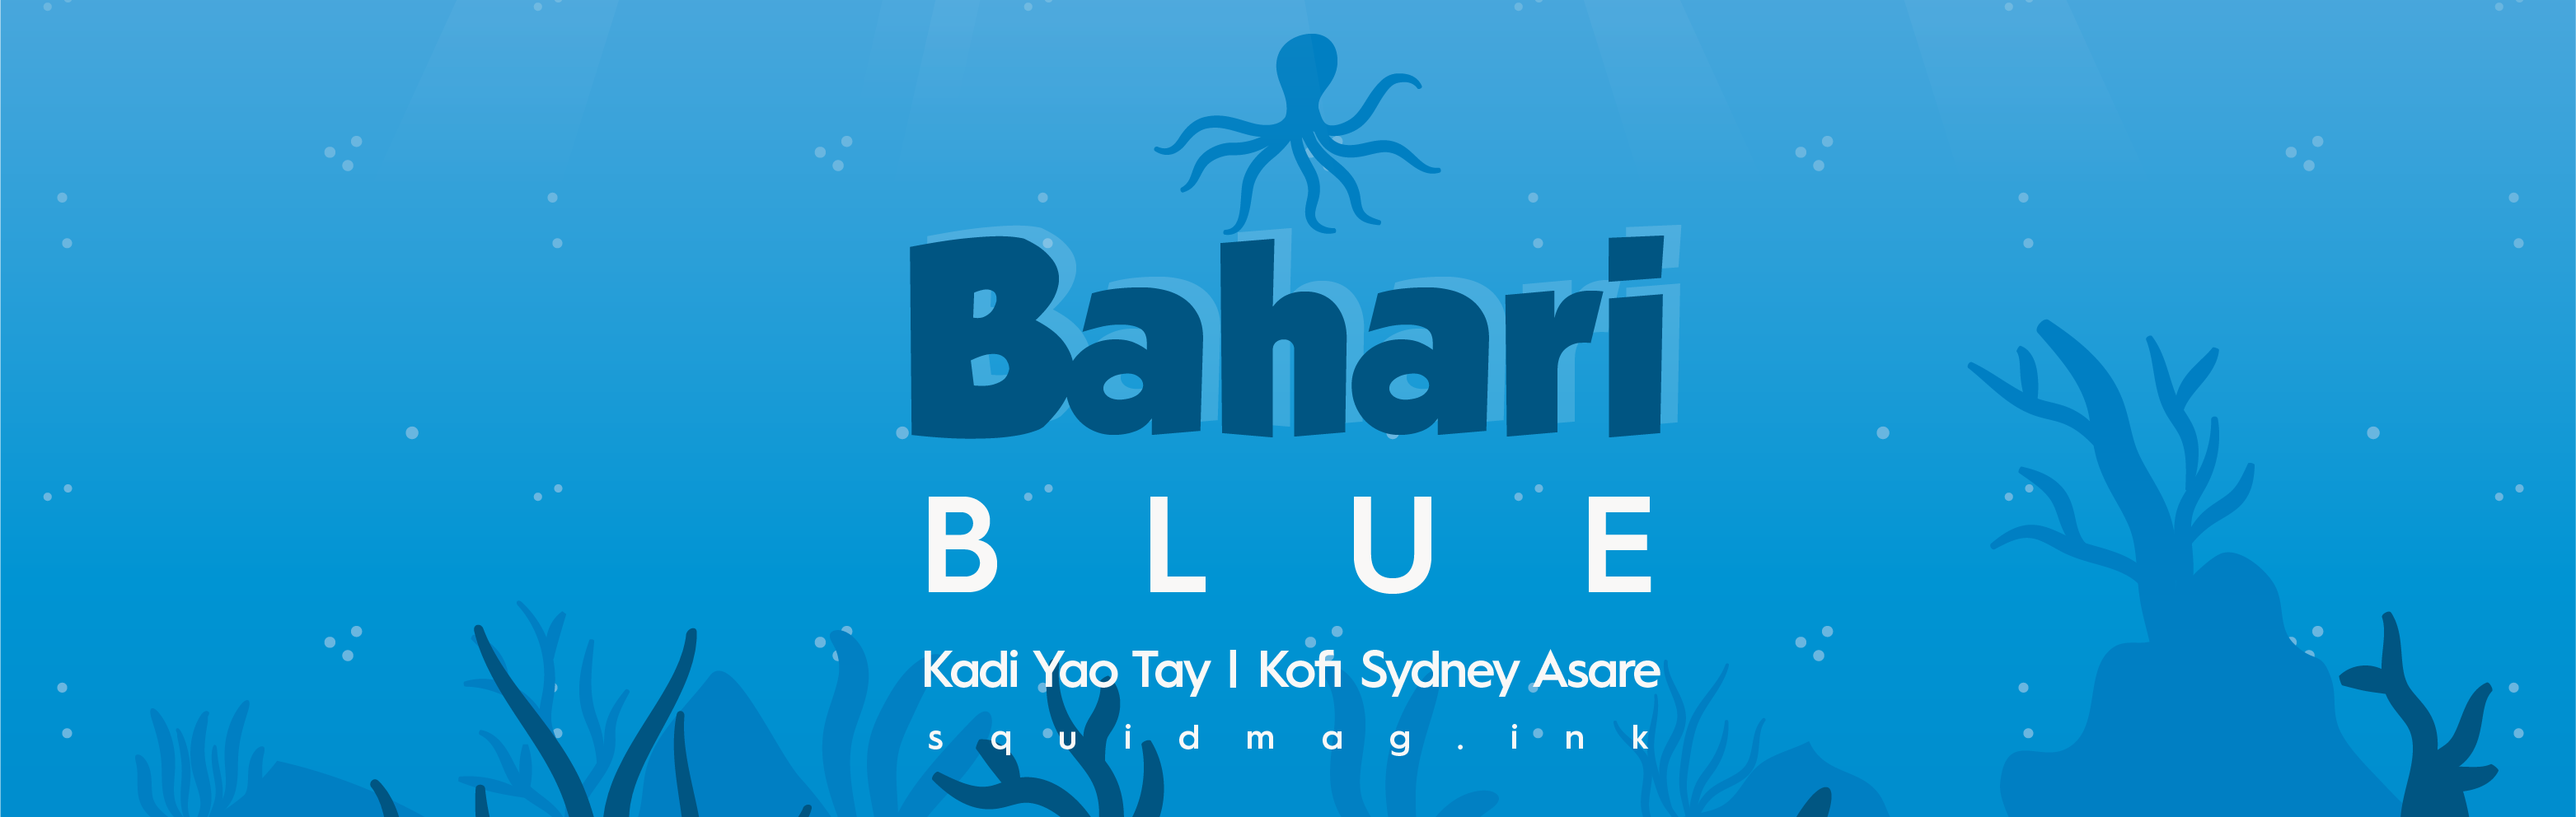 Bahari Blue curated by Squid Mag's Kadi Yao Tay and Kofi Sydney Asare